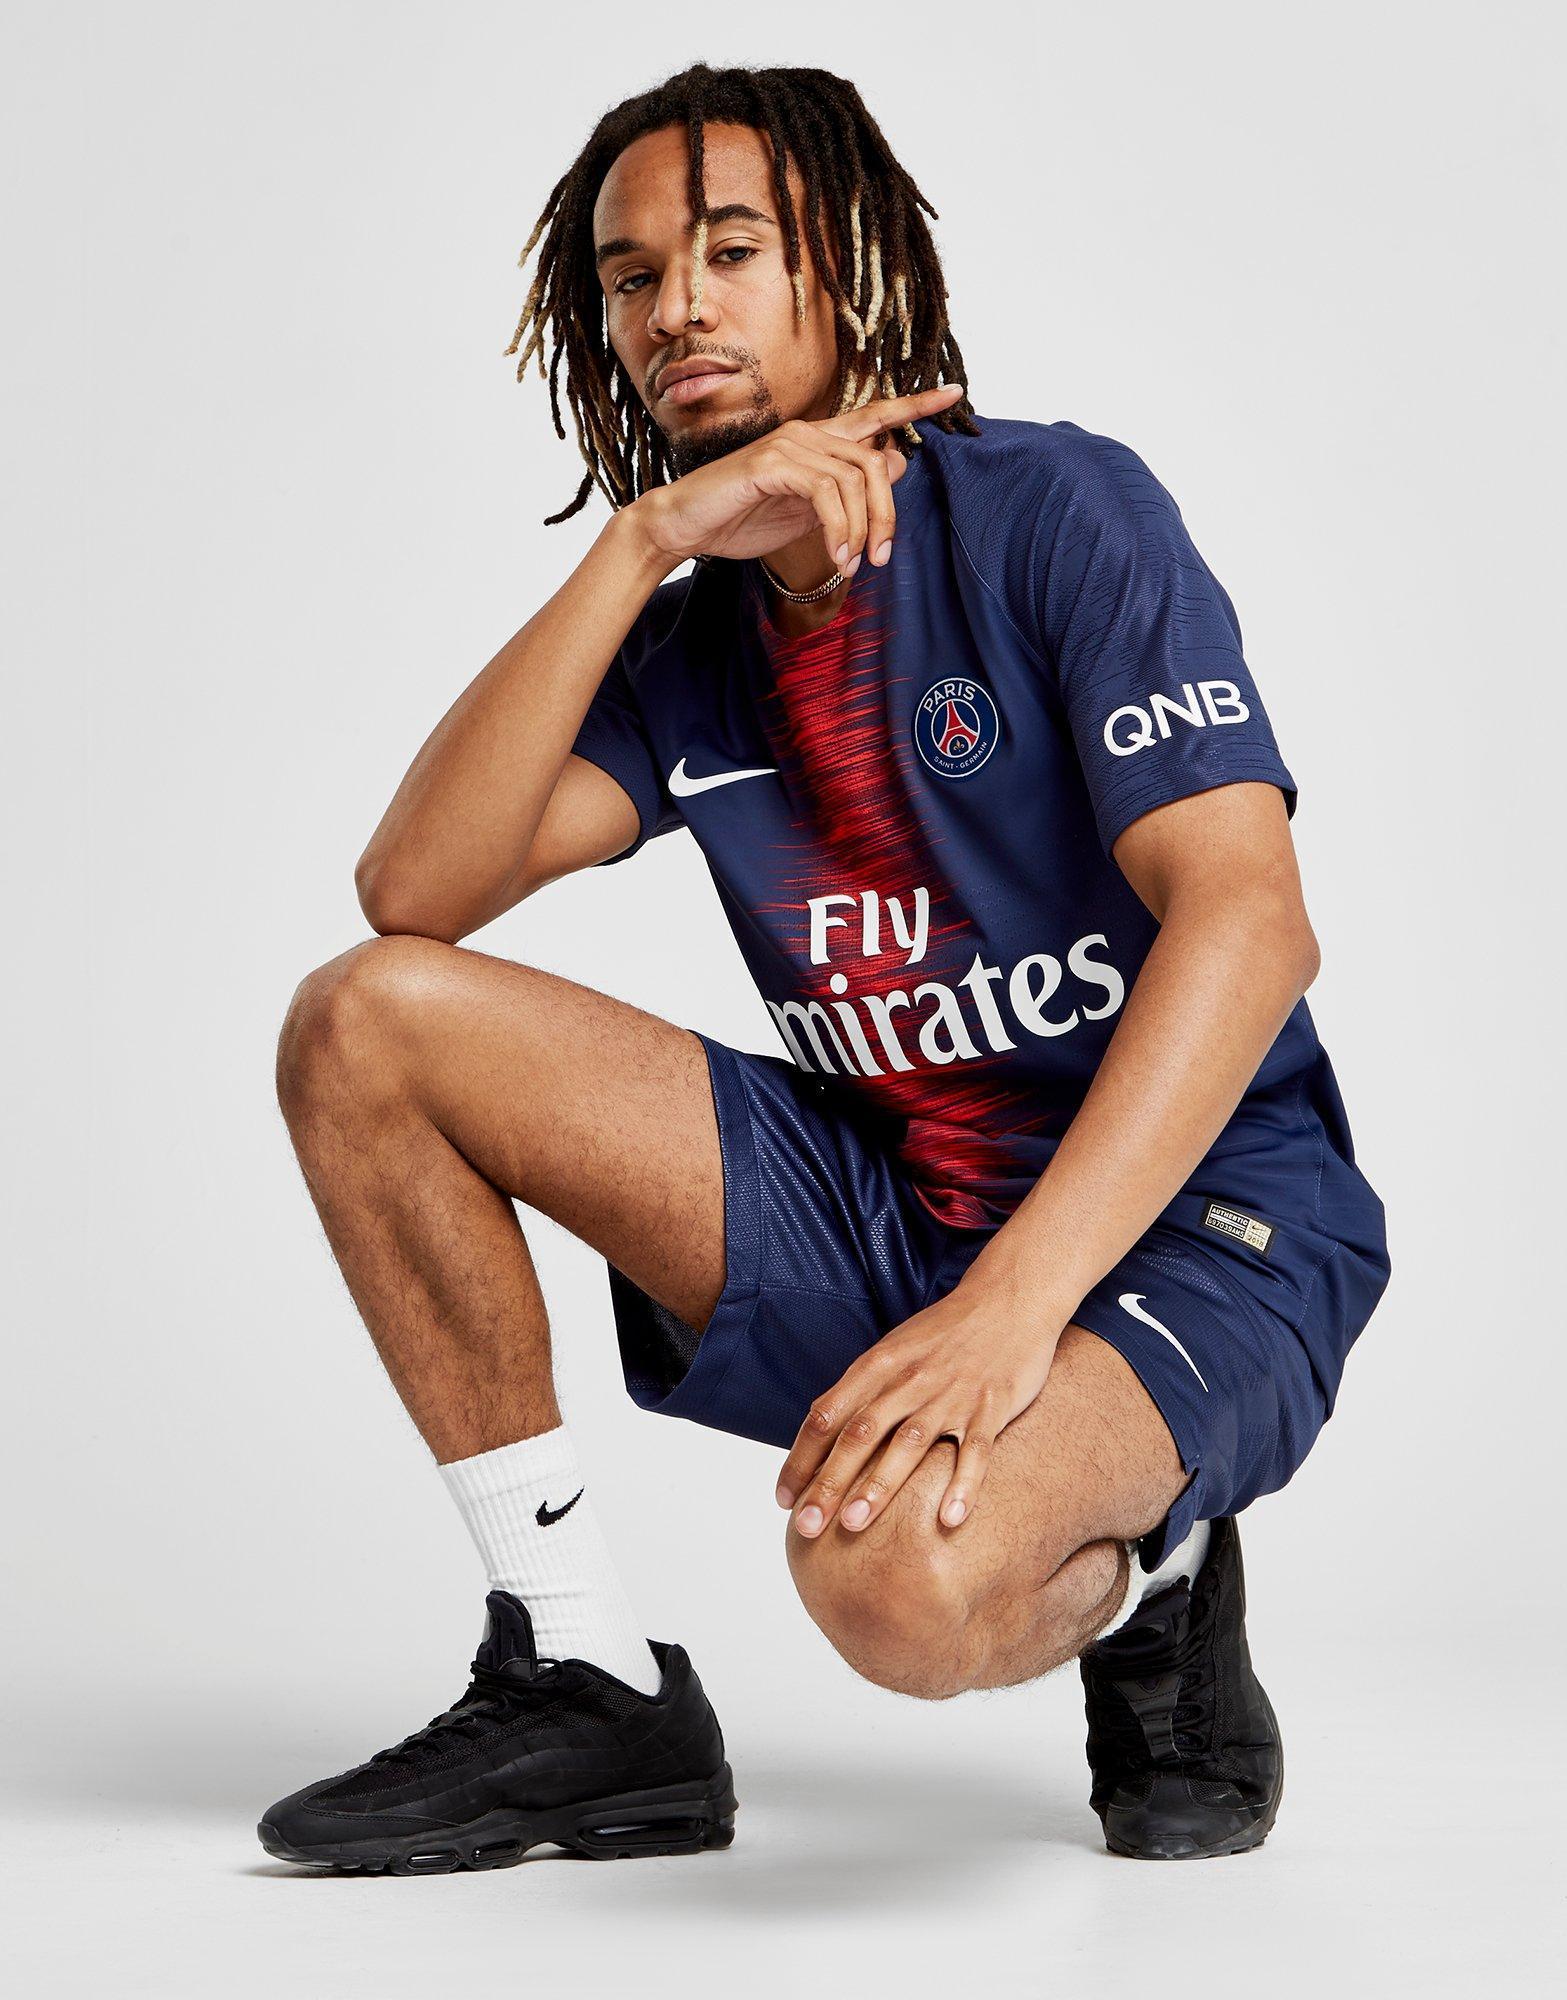 c8610418dfeac Nike Paris Saint Germain 2018 19 Home Vapor Shirt in Blue for Men - Lyst